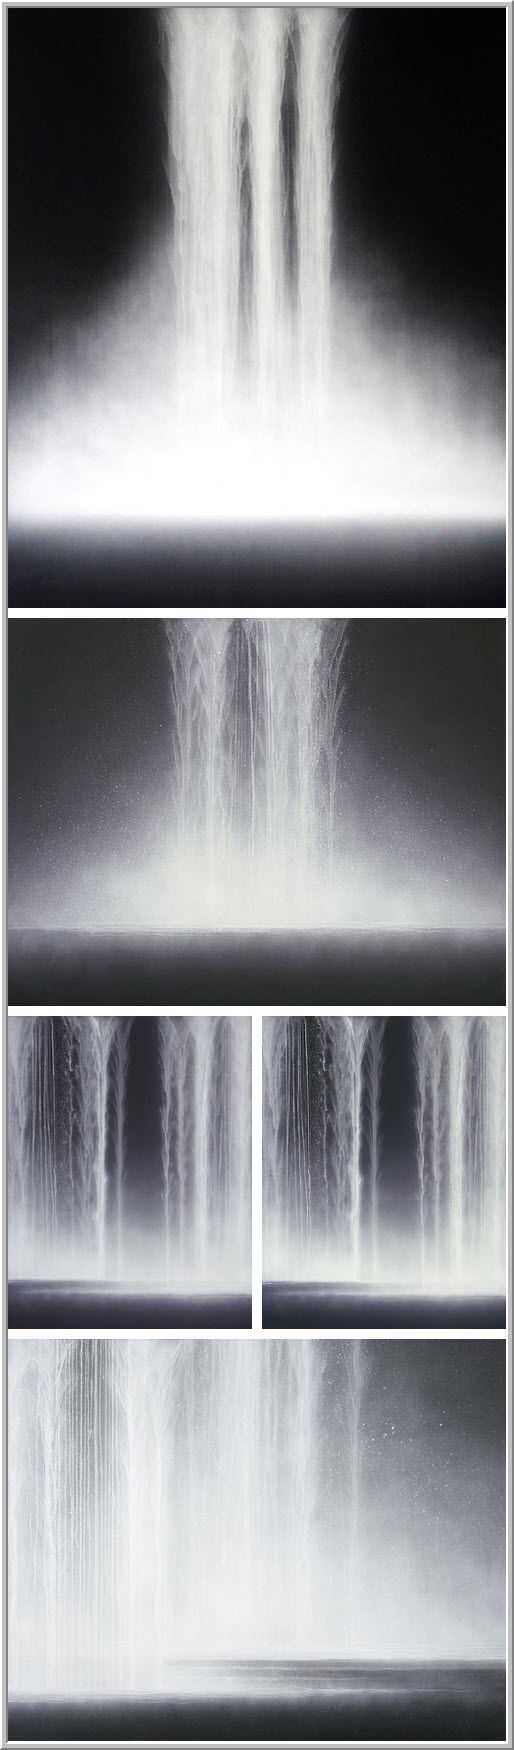 Hiroshi Senju - Waterfalls, 2009    Natural pigments on Japanese mulberry paper